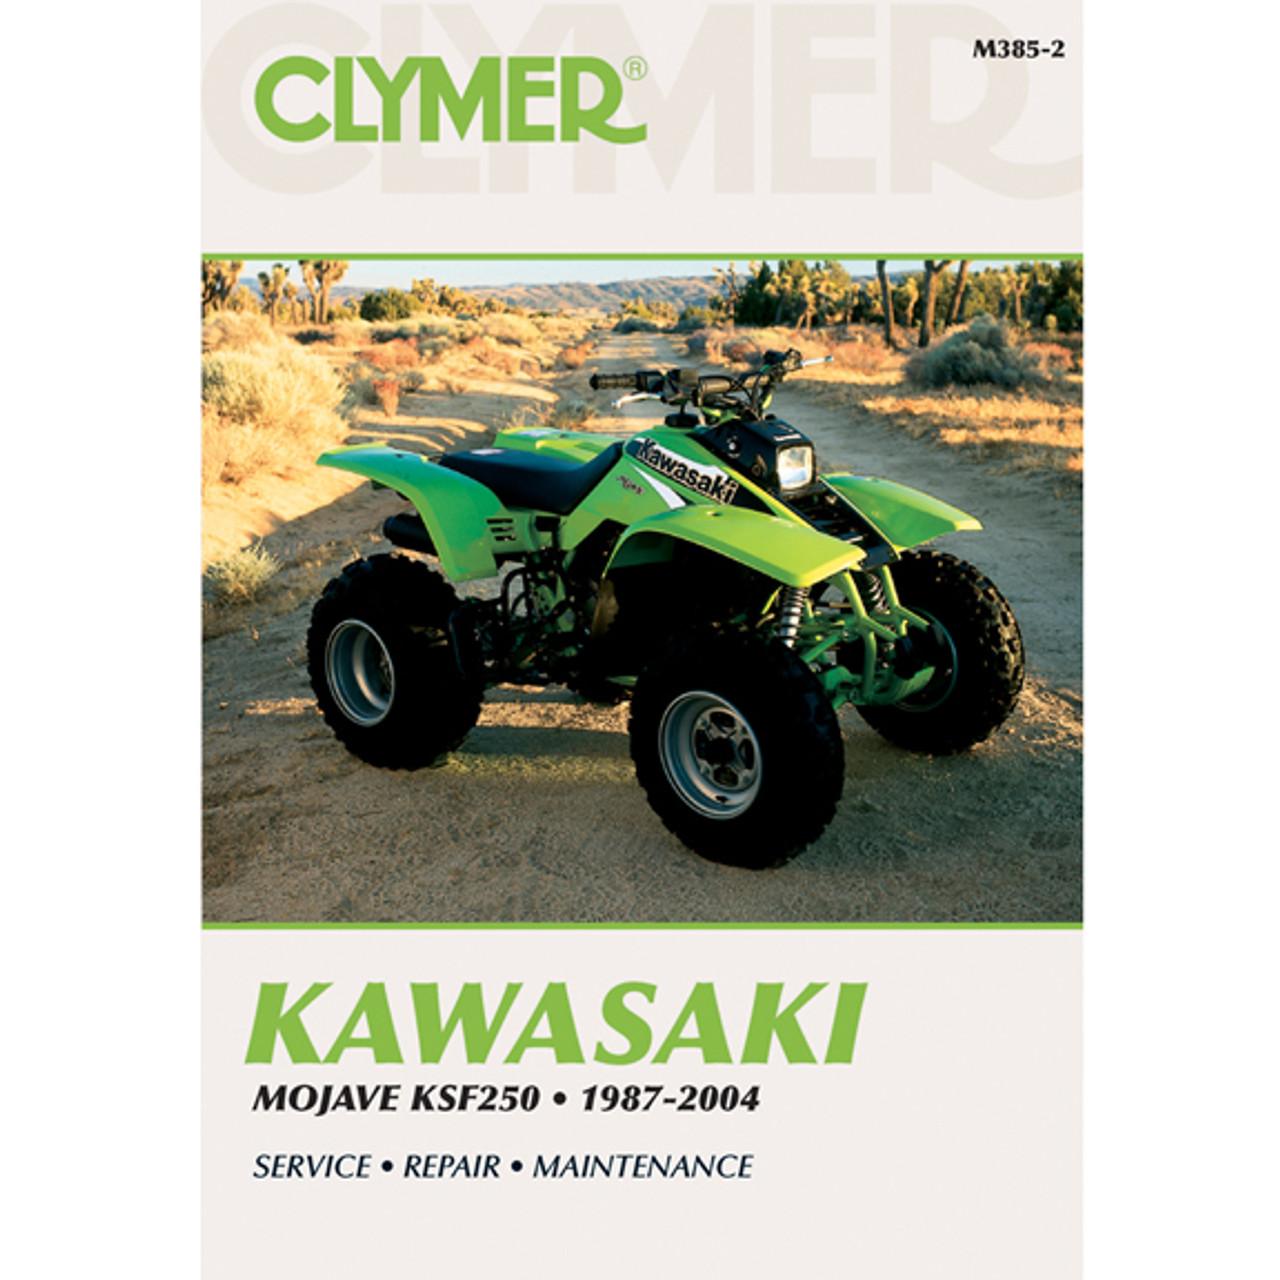 clymer m385 2 service shop repair manual kawasaki mojave ksf250 1987 rh speedaddicts com  kawasaki z900 manuel